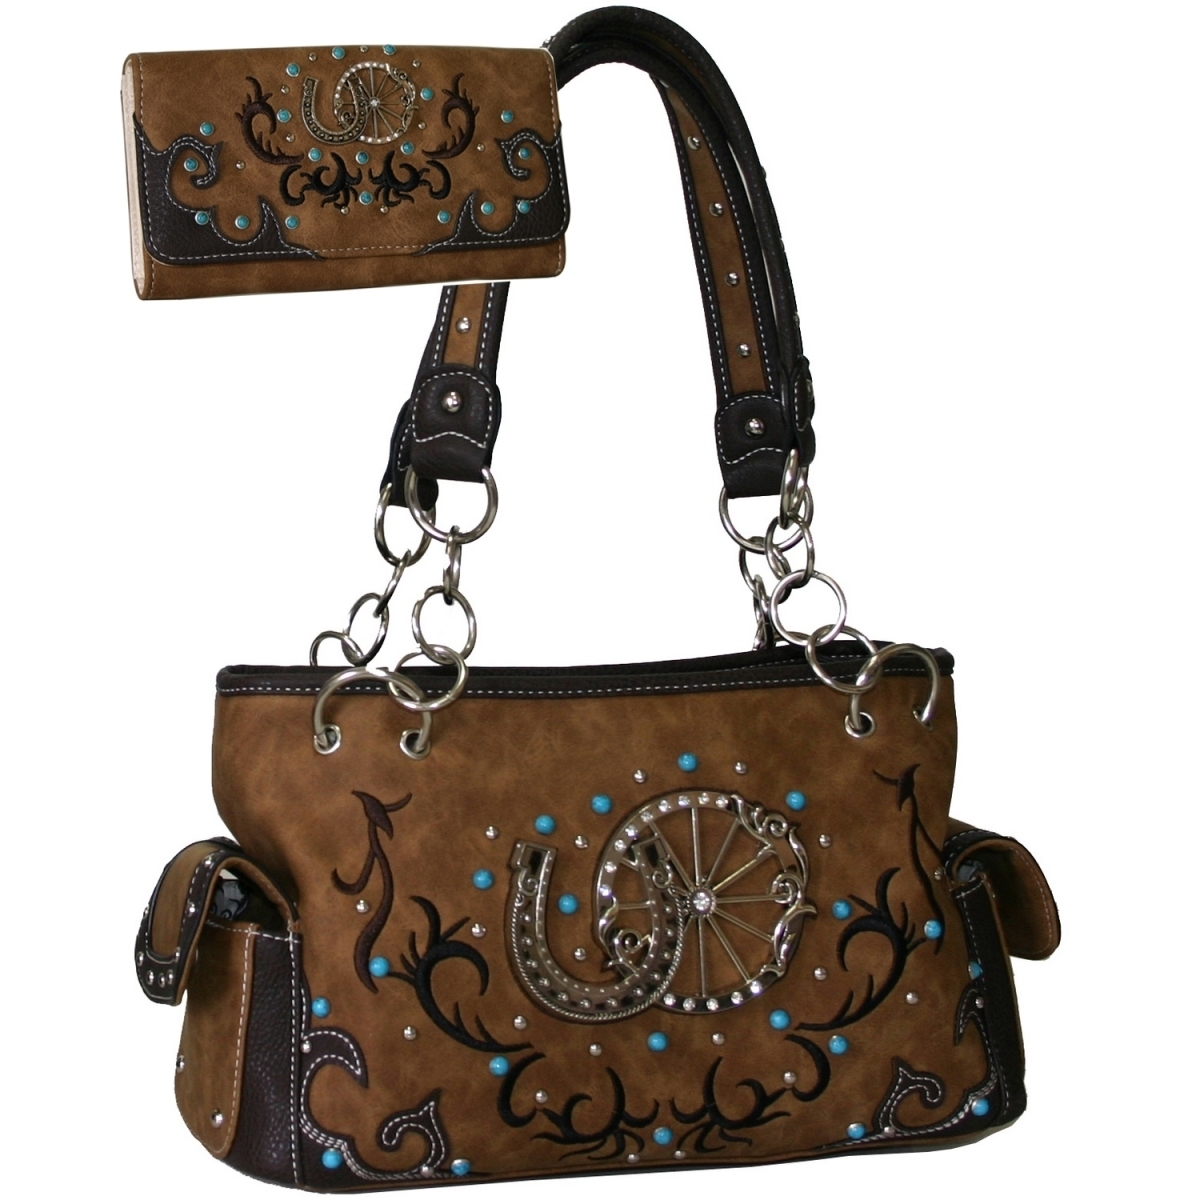 Gold Rush B501SET-TAN Western Studded Shoulder Bag with Matching Wallet - Tan modalu london mh6145 tan